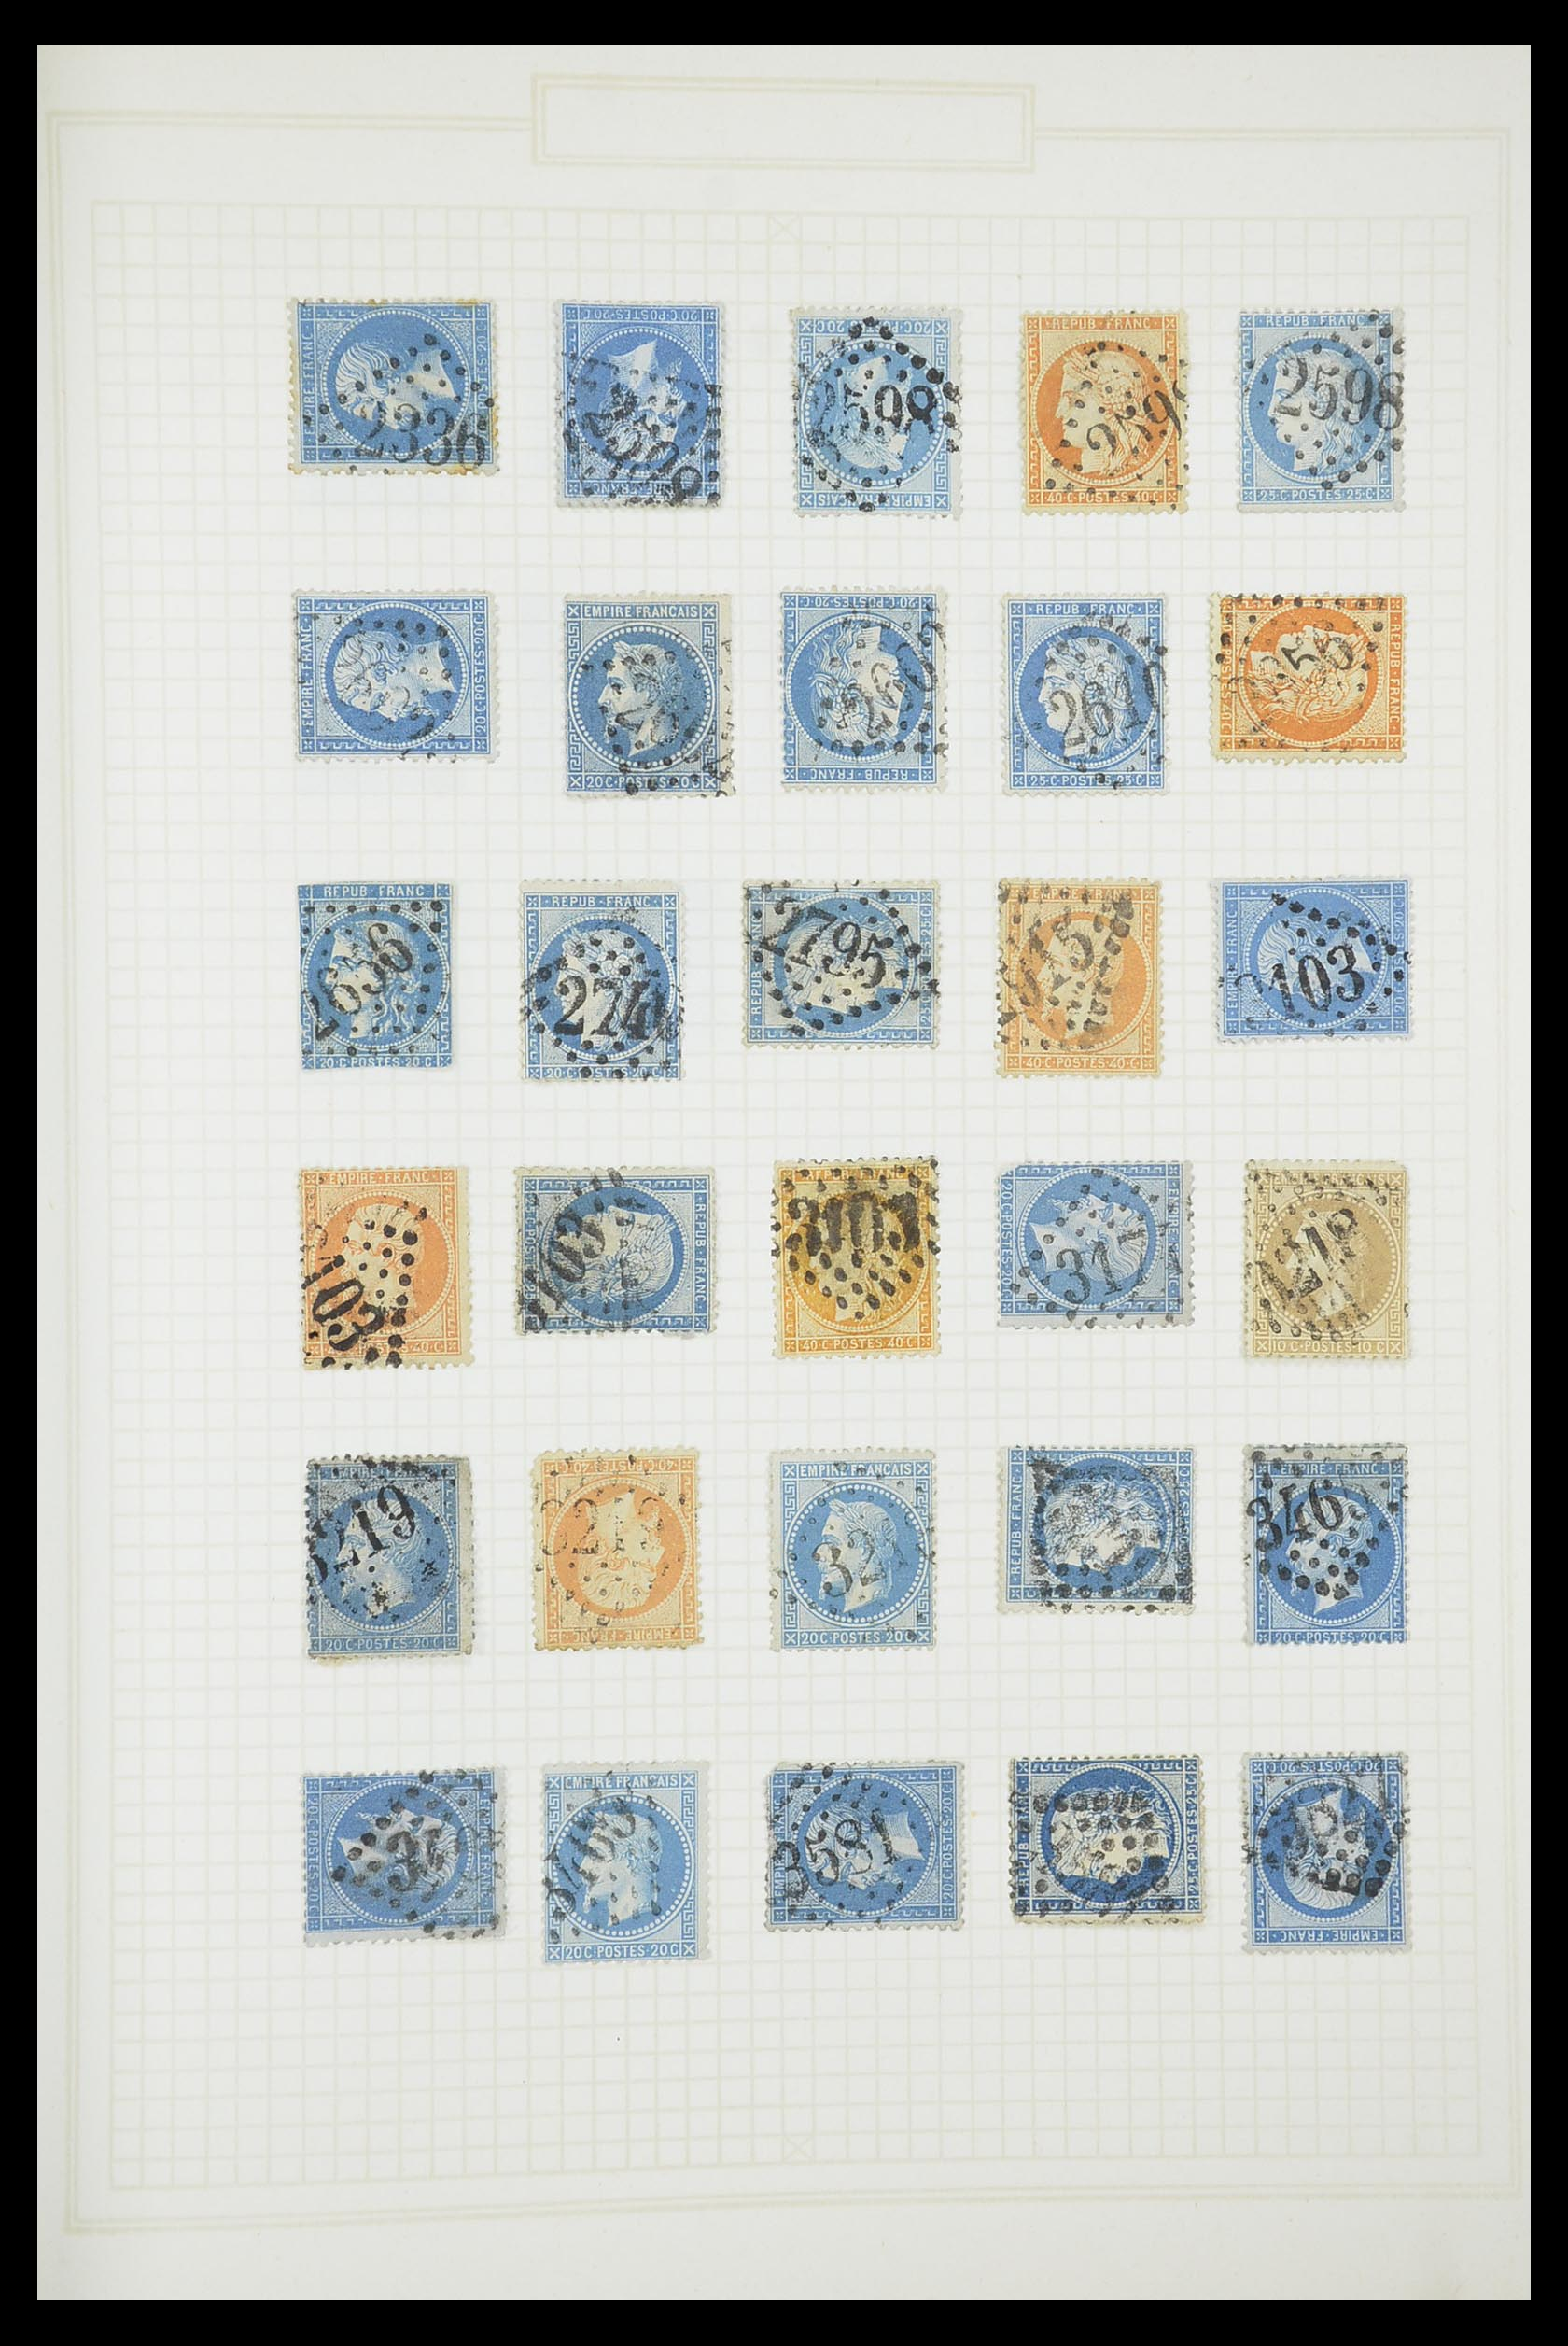 33851 013 - Postzegelverzameling 33851 Frankrijk klassiek stempels.